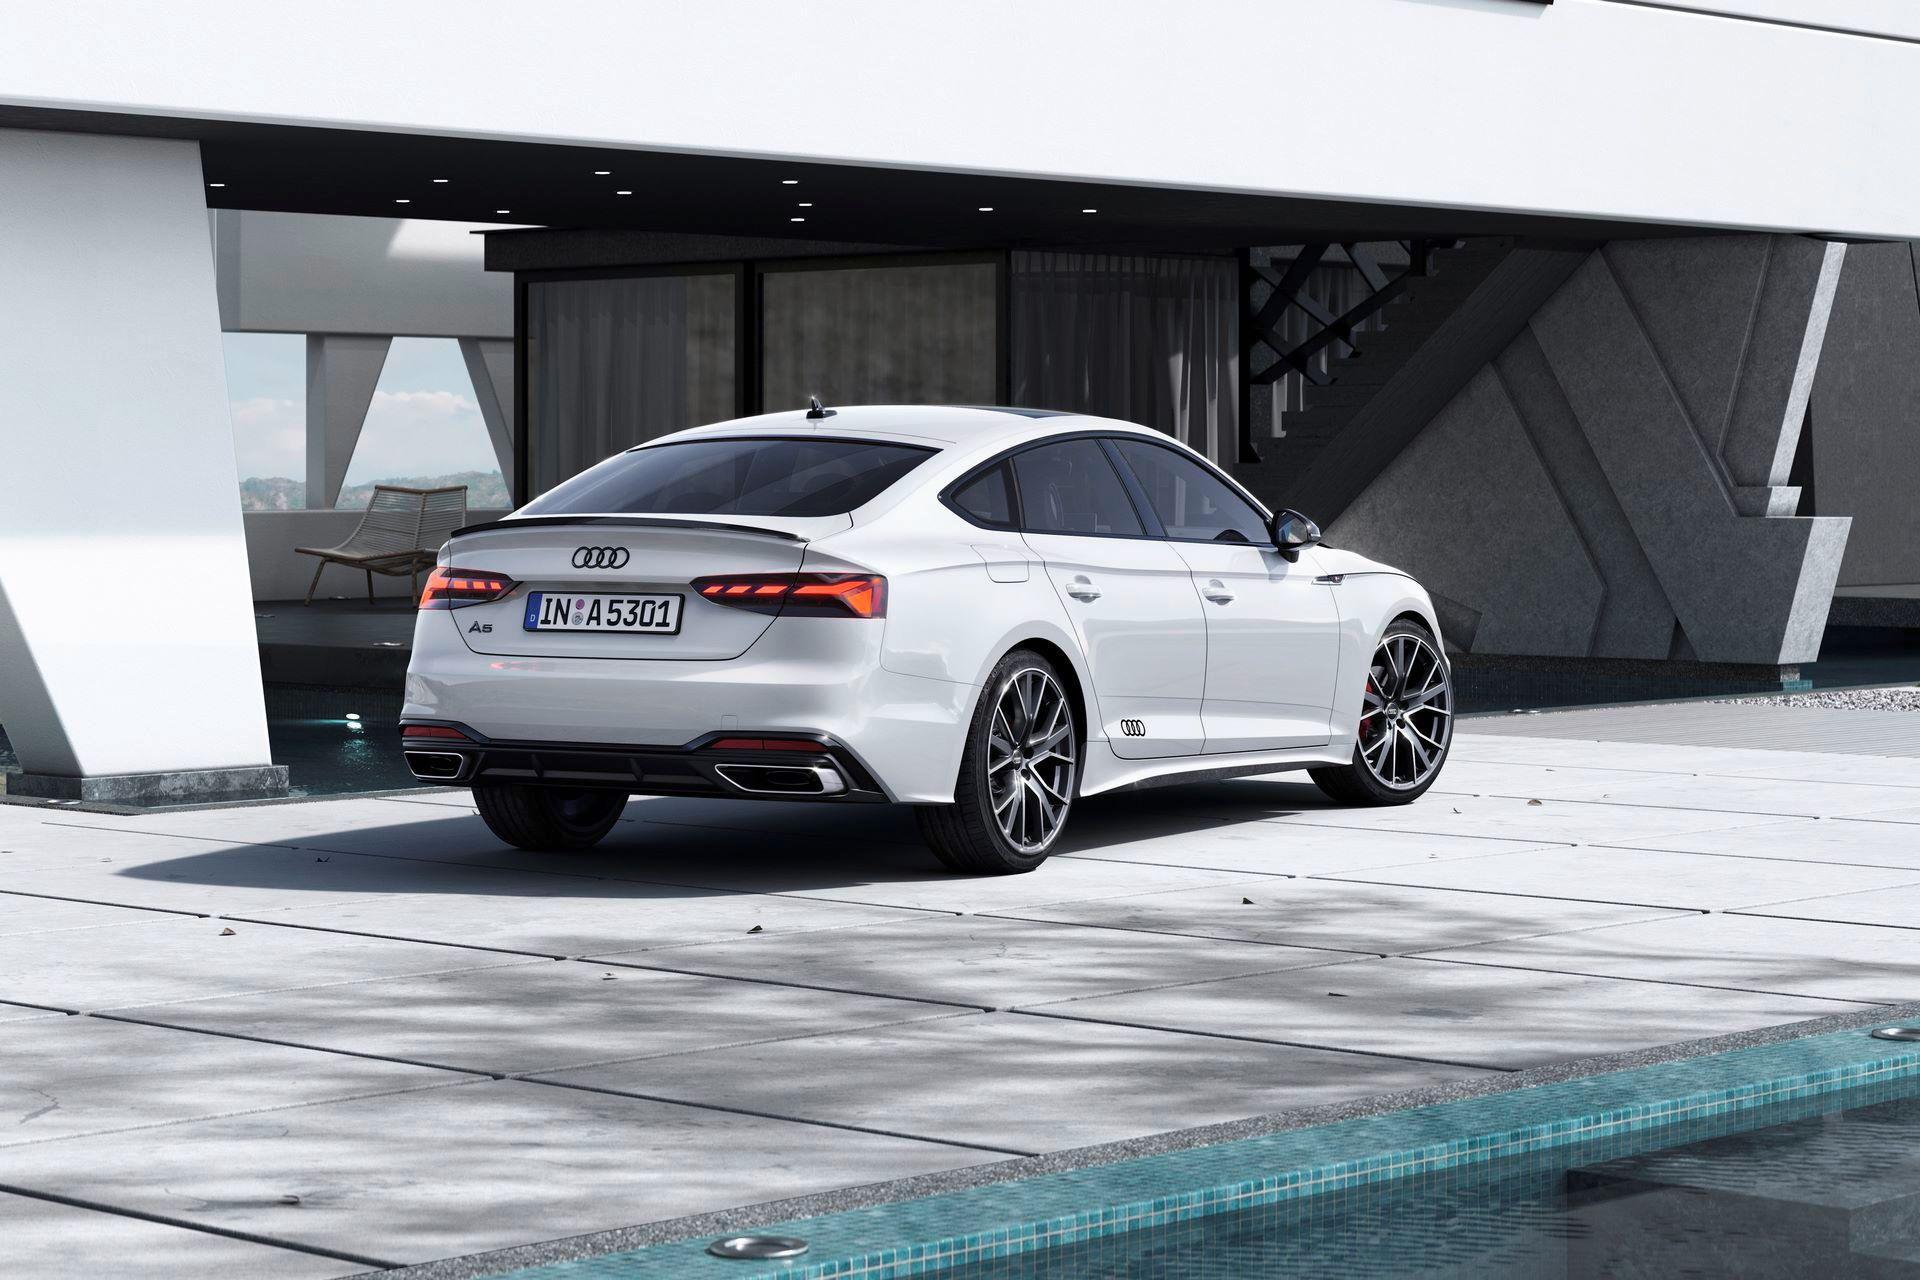 Audi-A4-A5-Q7-Q8-Competition-And-Competition-Plus-Trims-64